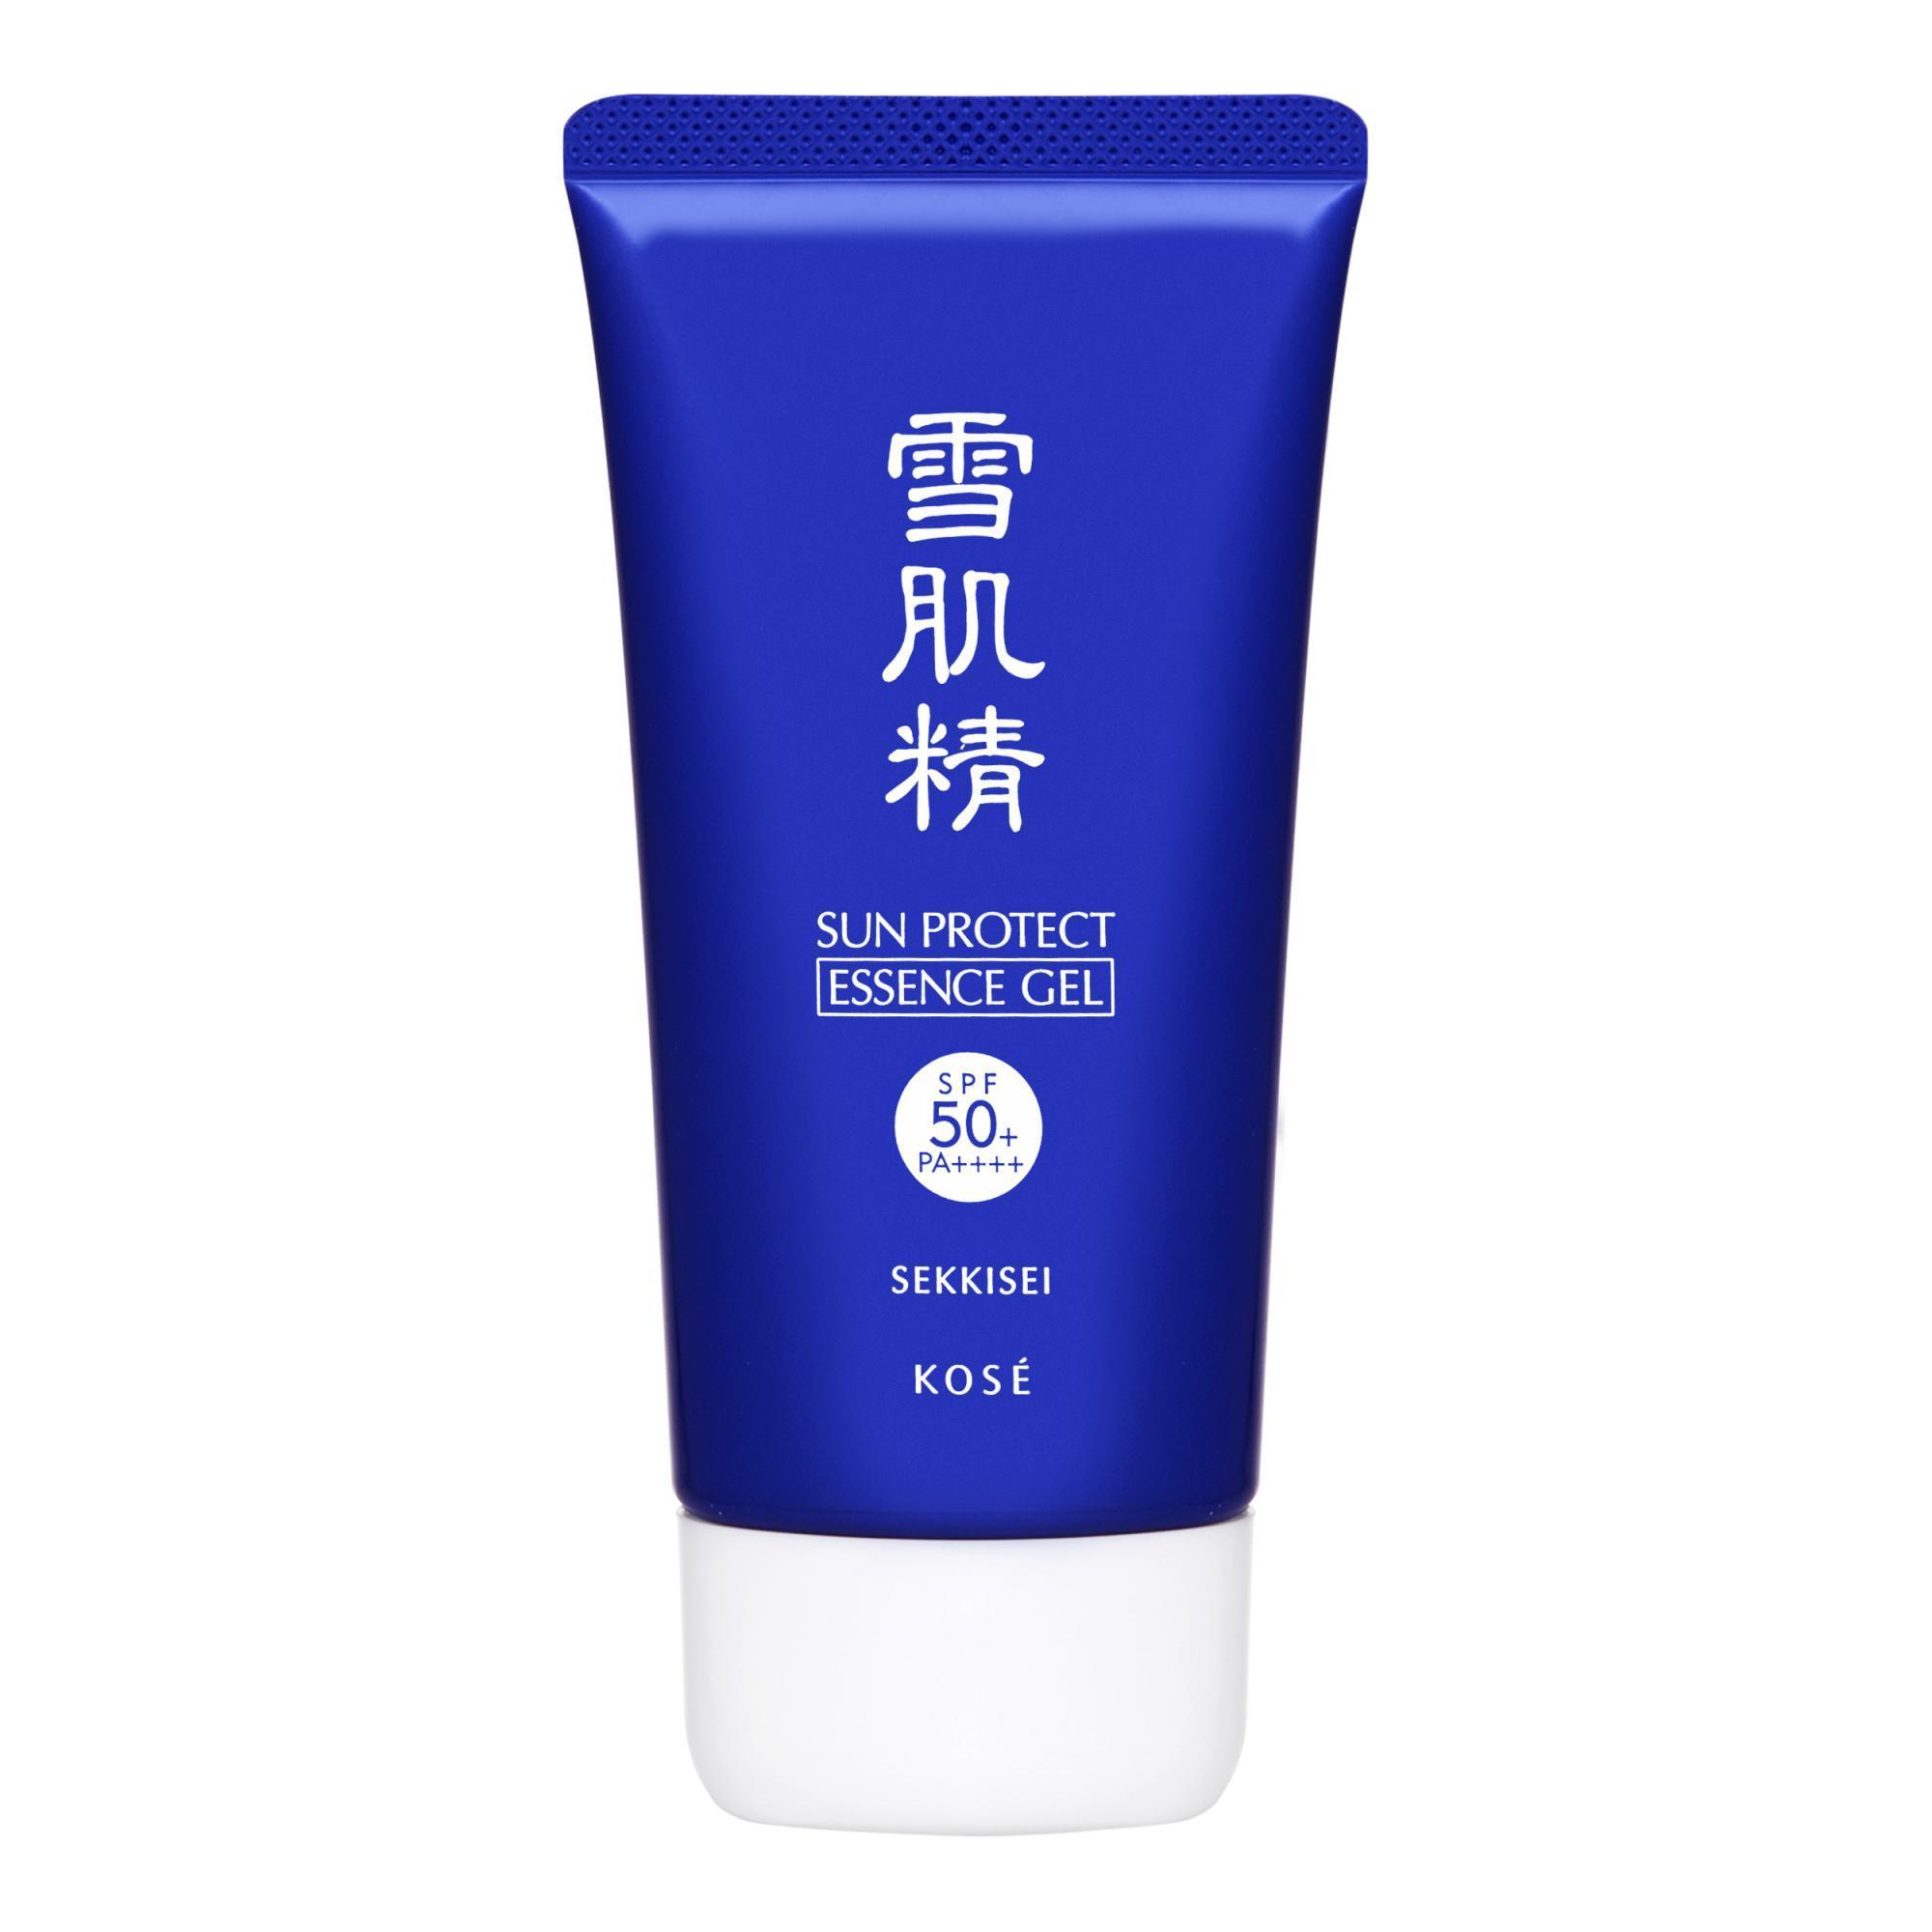 Kose Sekkisei Sun Protect Essence Gel N Spf50 Pa 81Ml 2 8Oz Intl In Stock